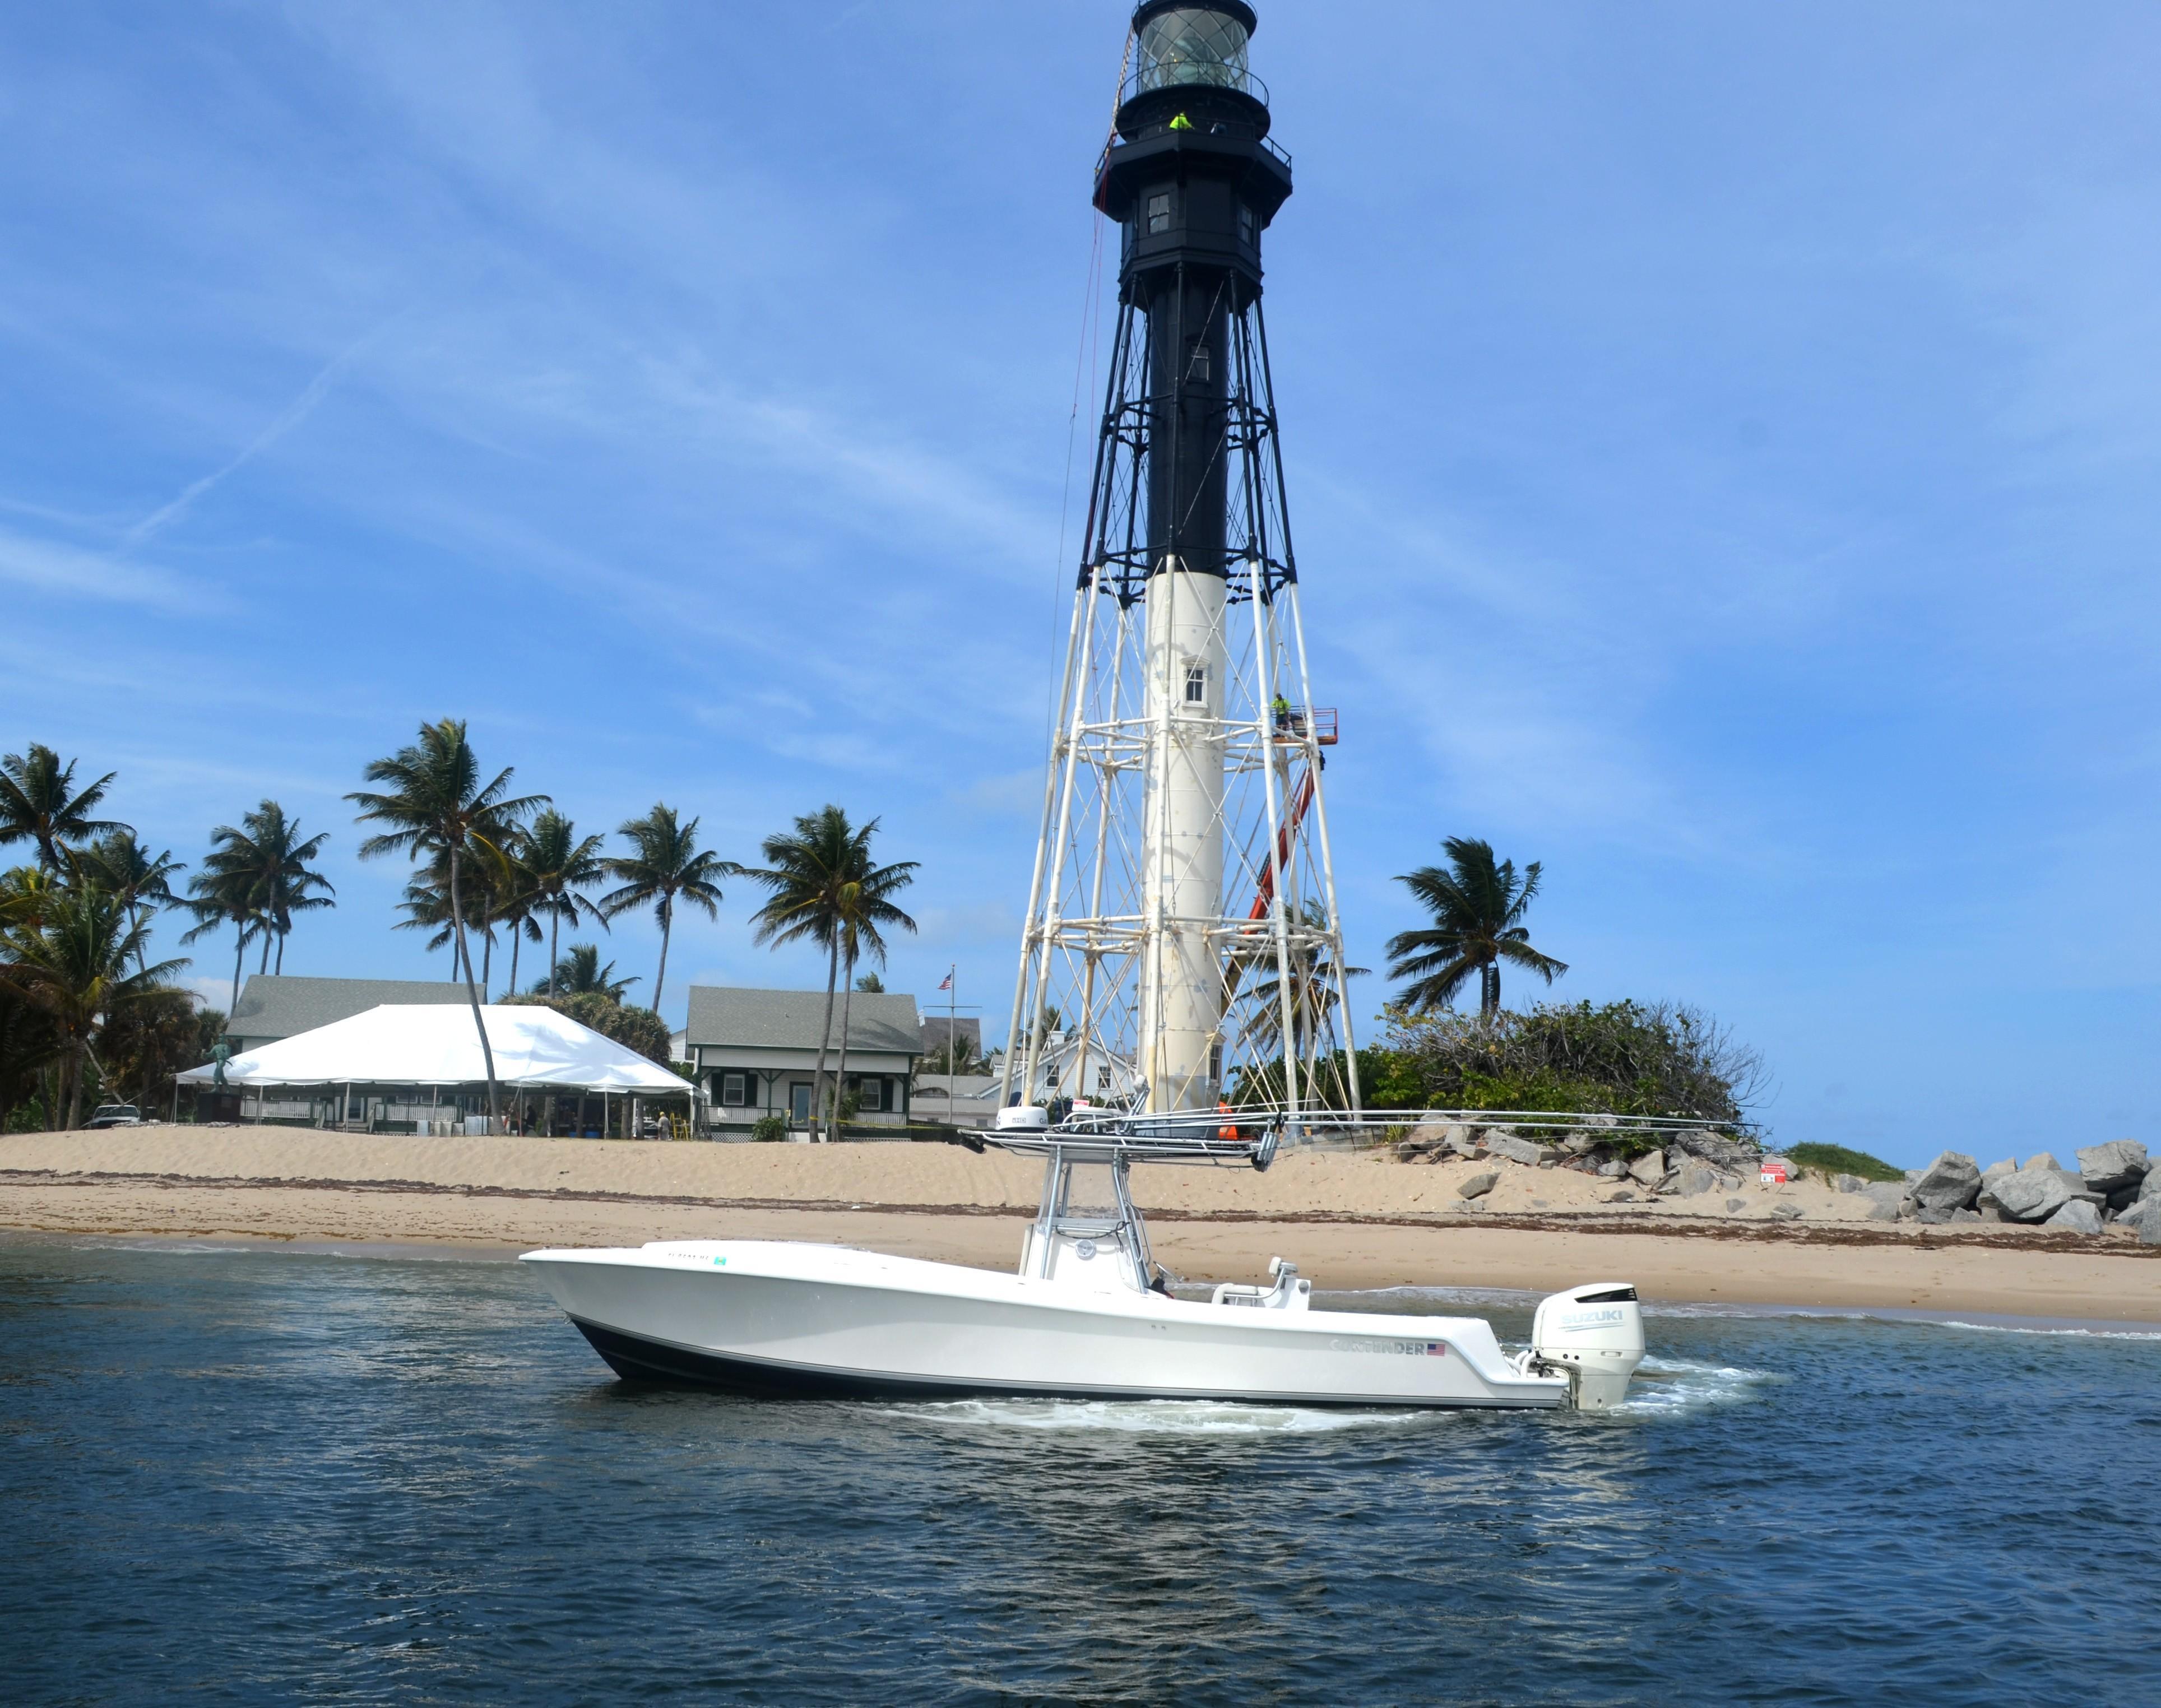 2004 Contender 31 Cuddy Pompano Beach, Florida - The Boat Kings